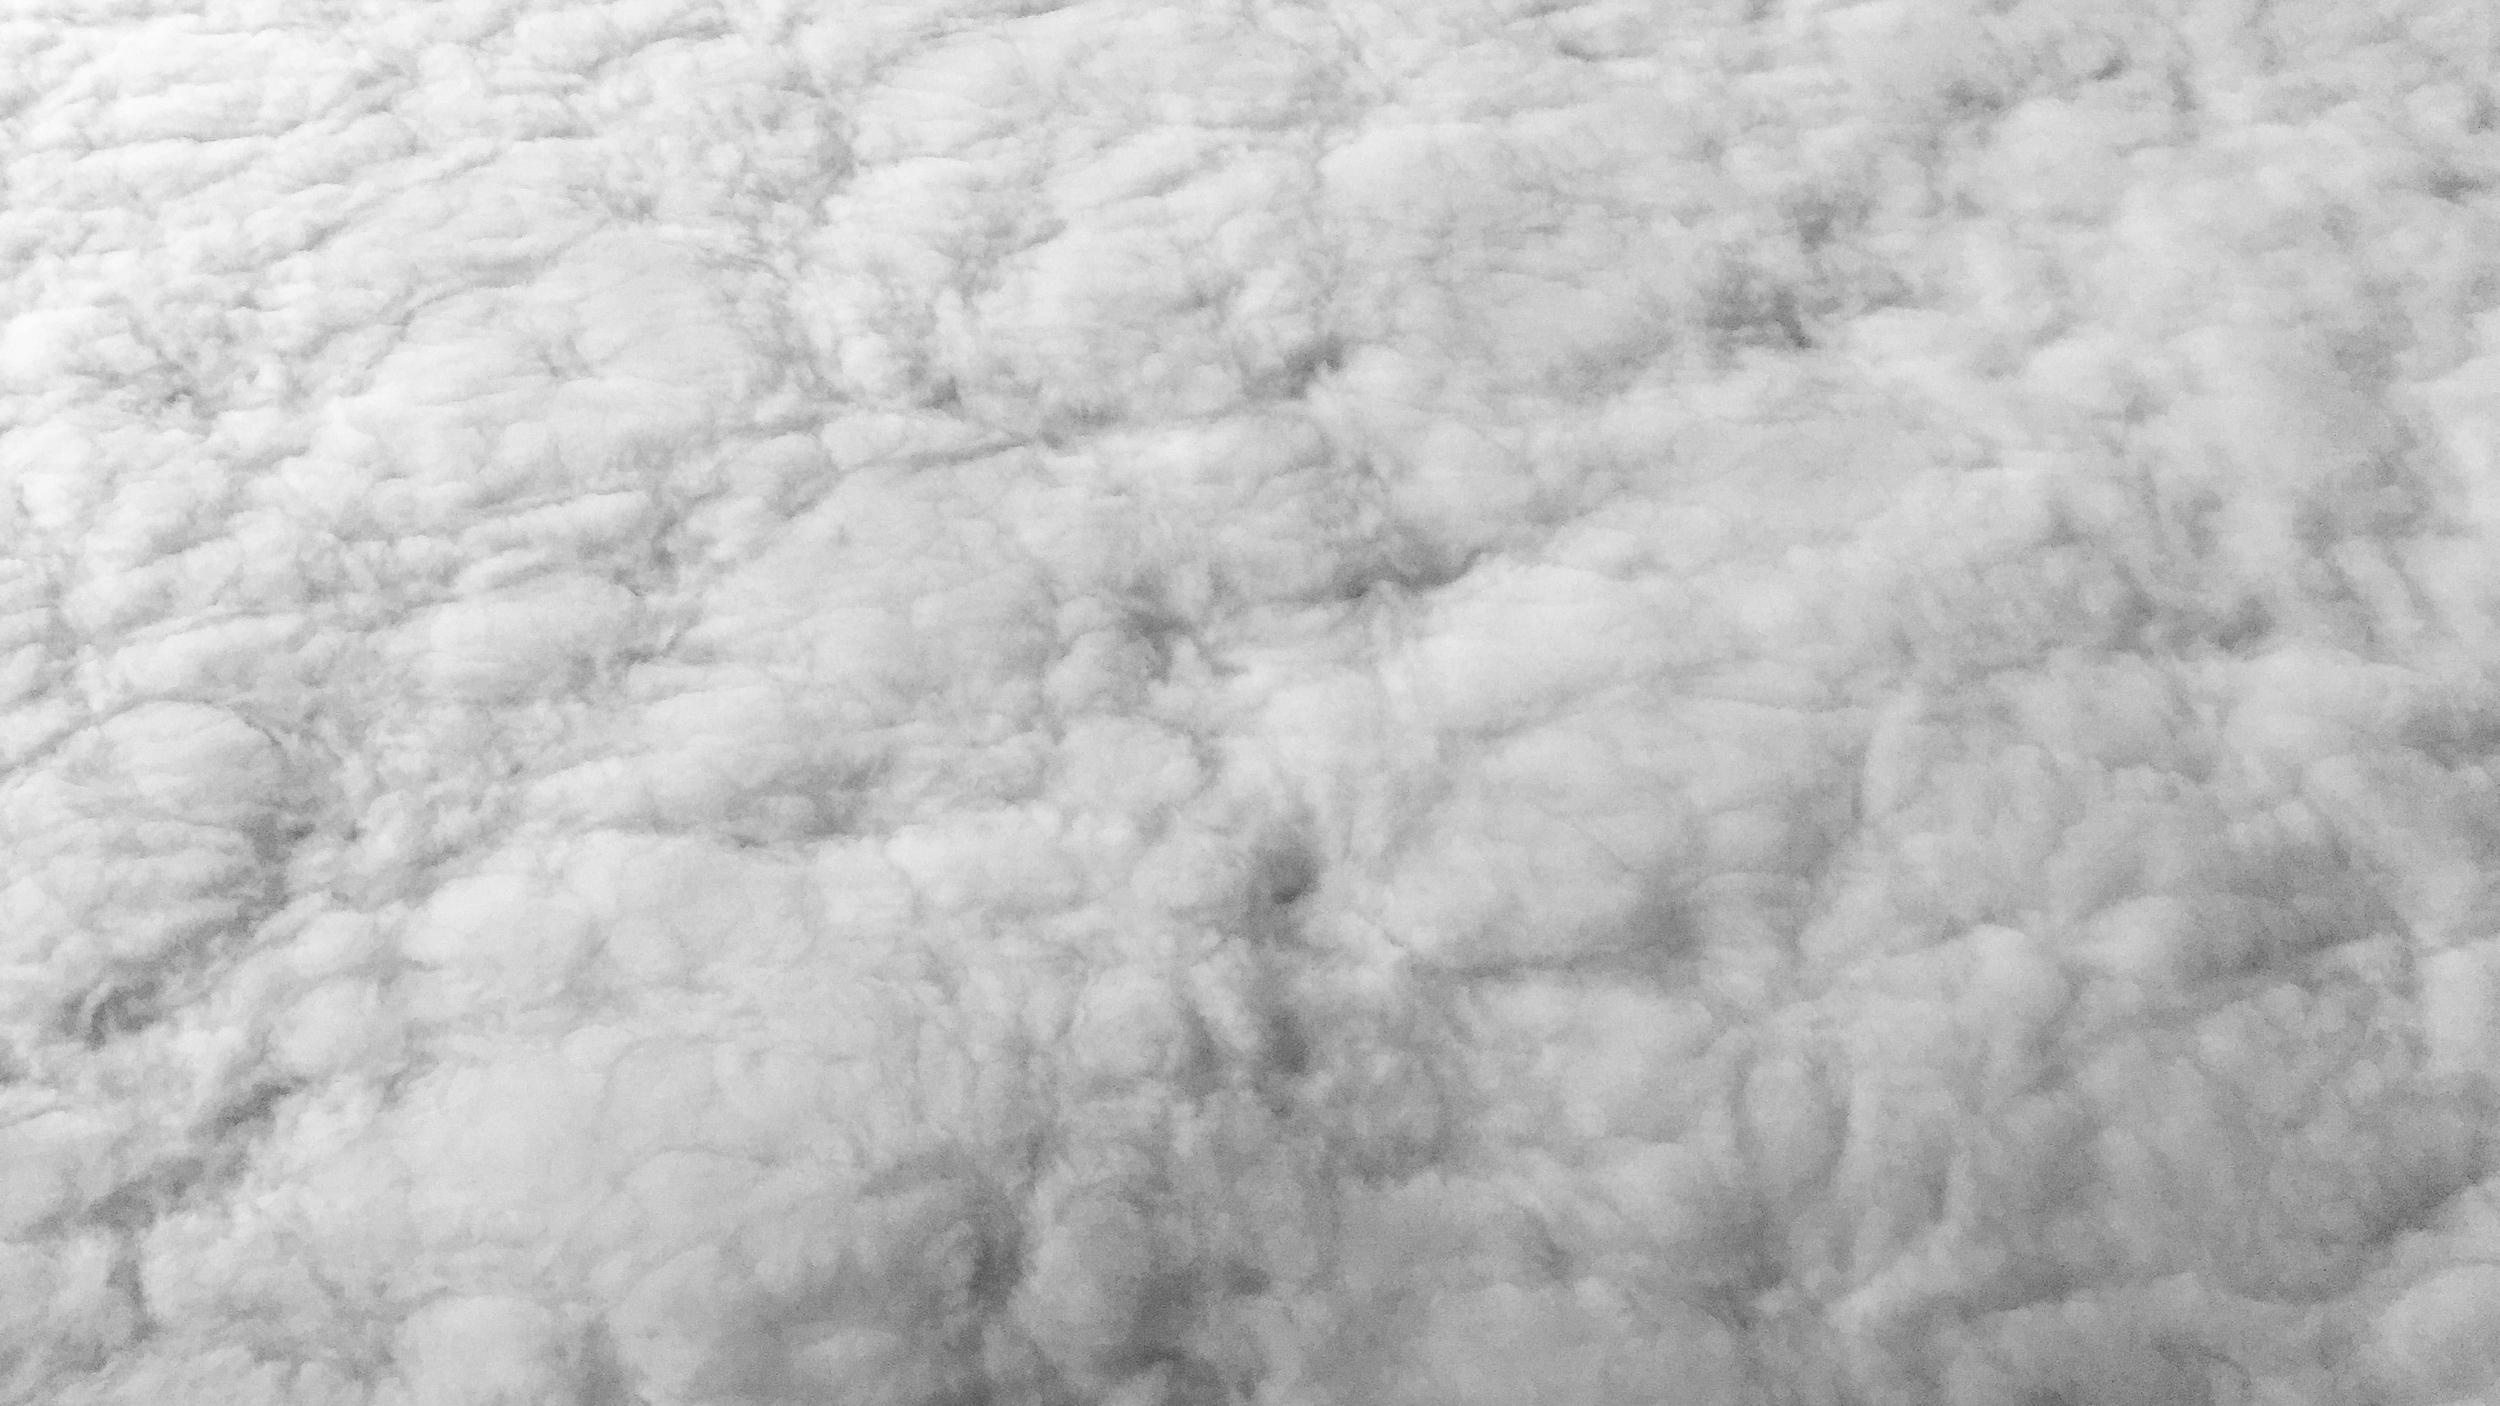 Title: Leominster, Massachusetts Year: 2015 Medium: Silver Gelatin Print Dimension: 17 × 22 in (43.18 × 55.88 cm)